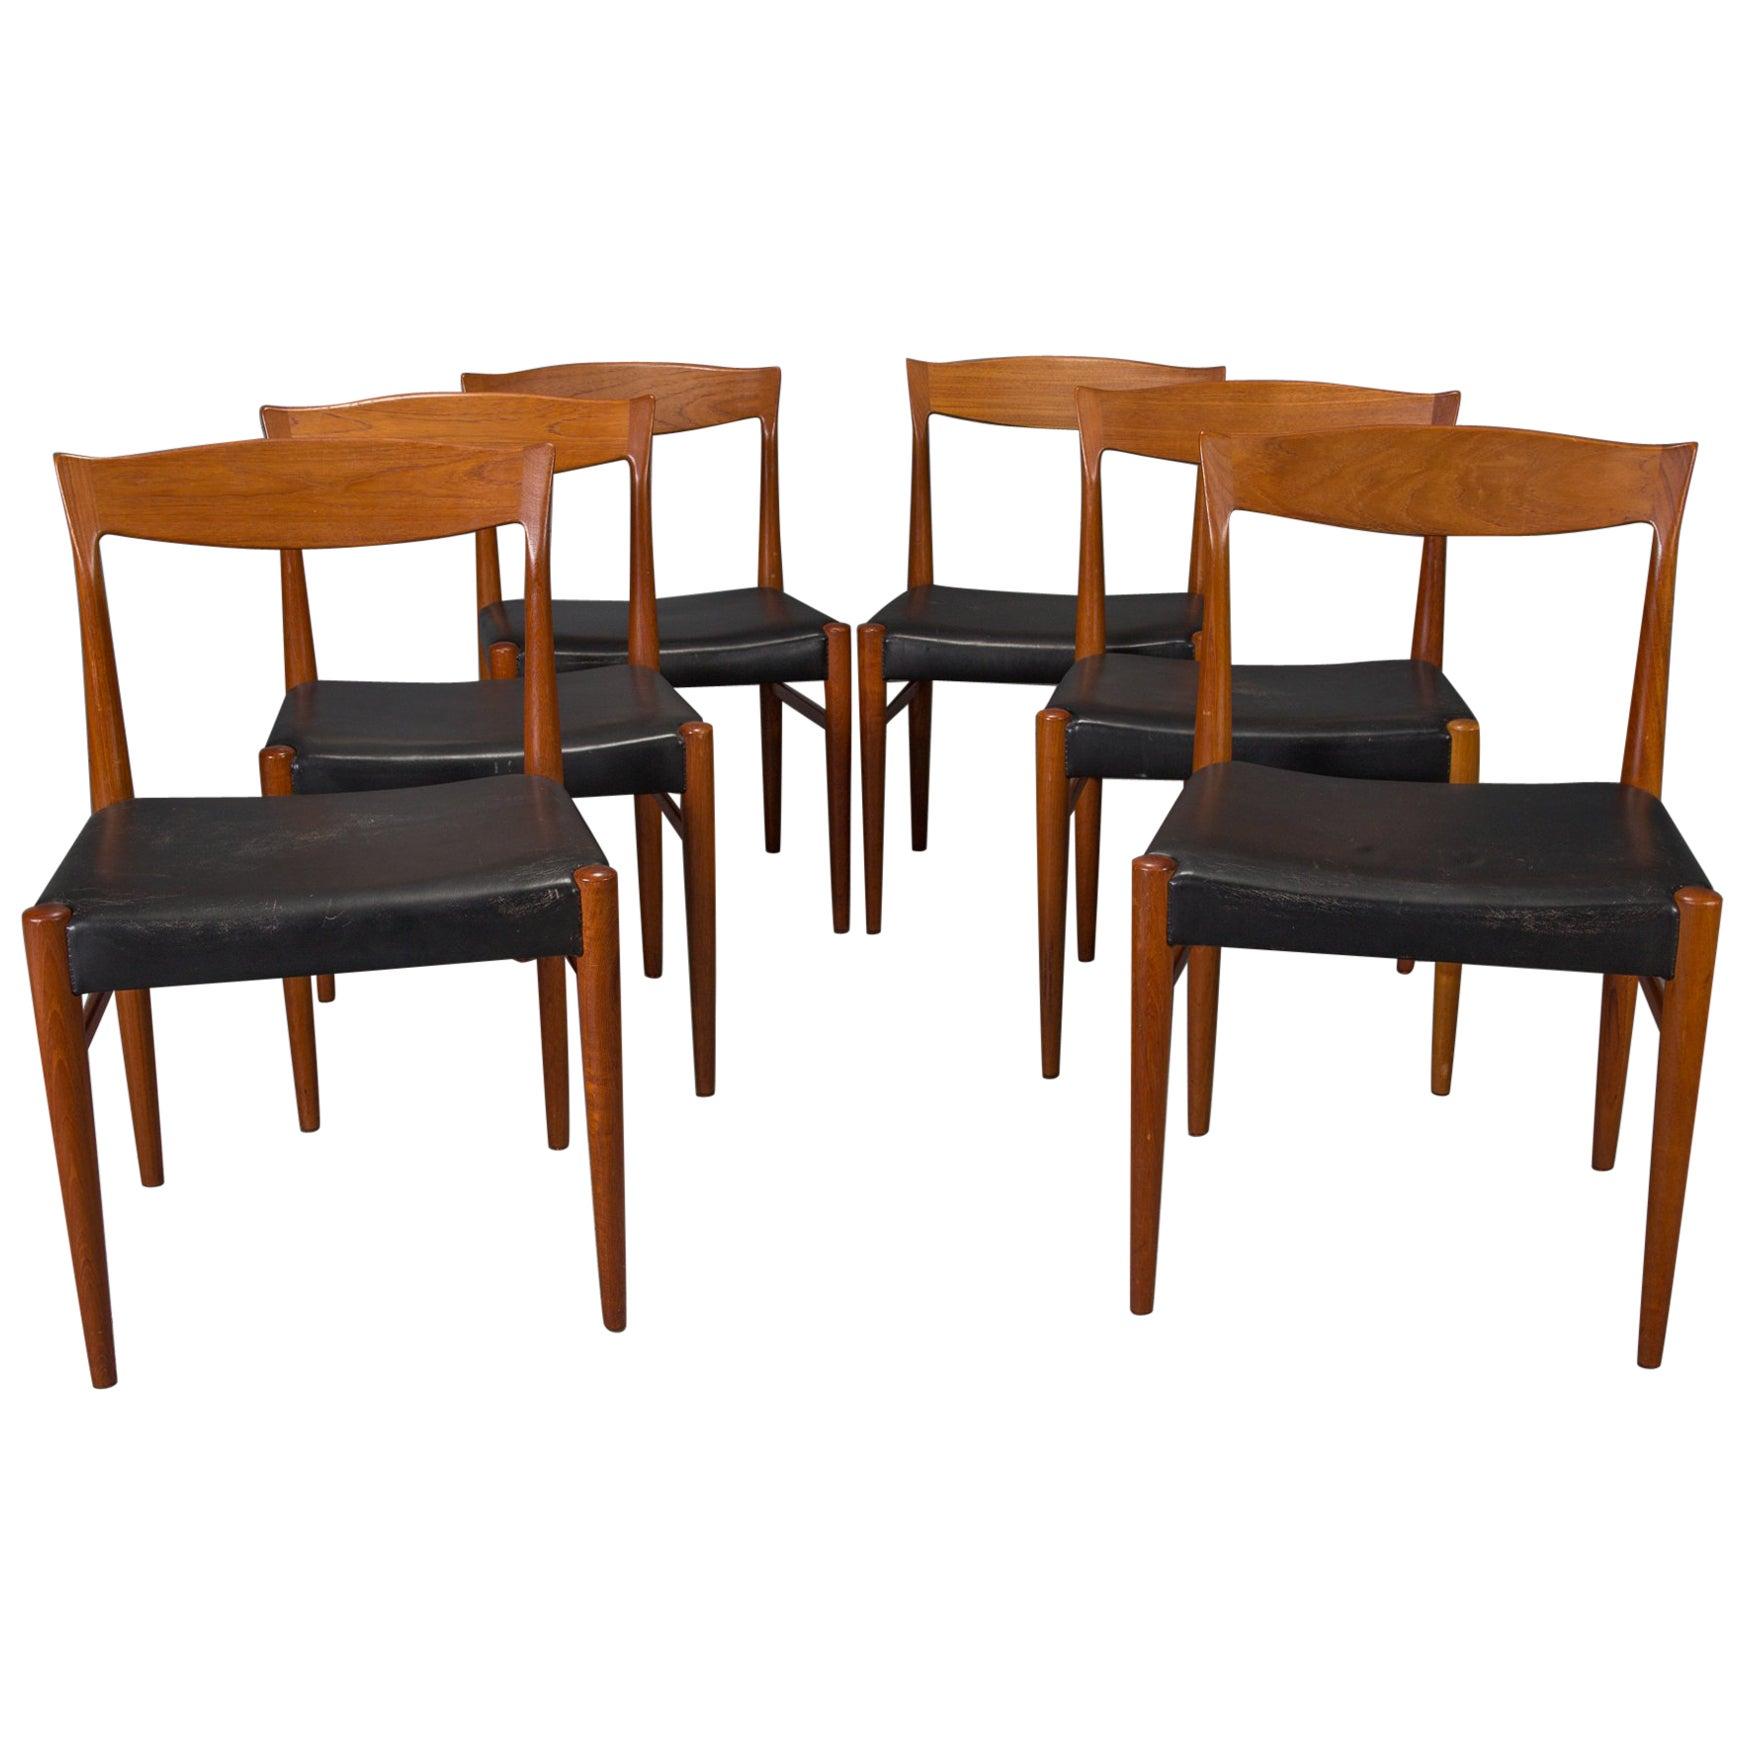 Set of Six Teak Danish Modern Dining Chairs by Henning Kjaernulf